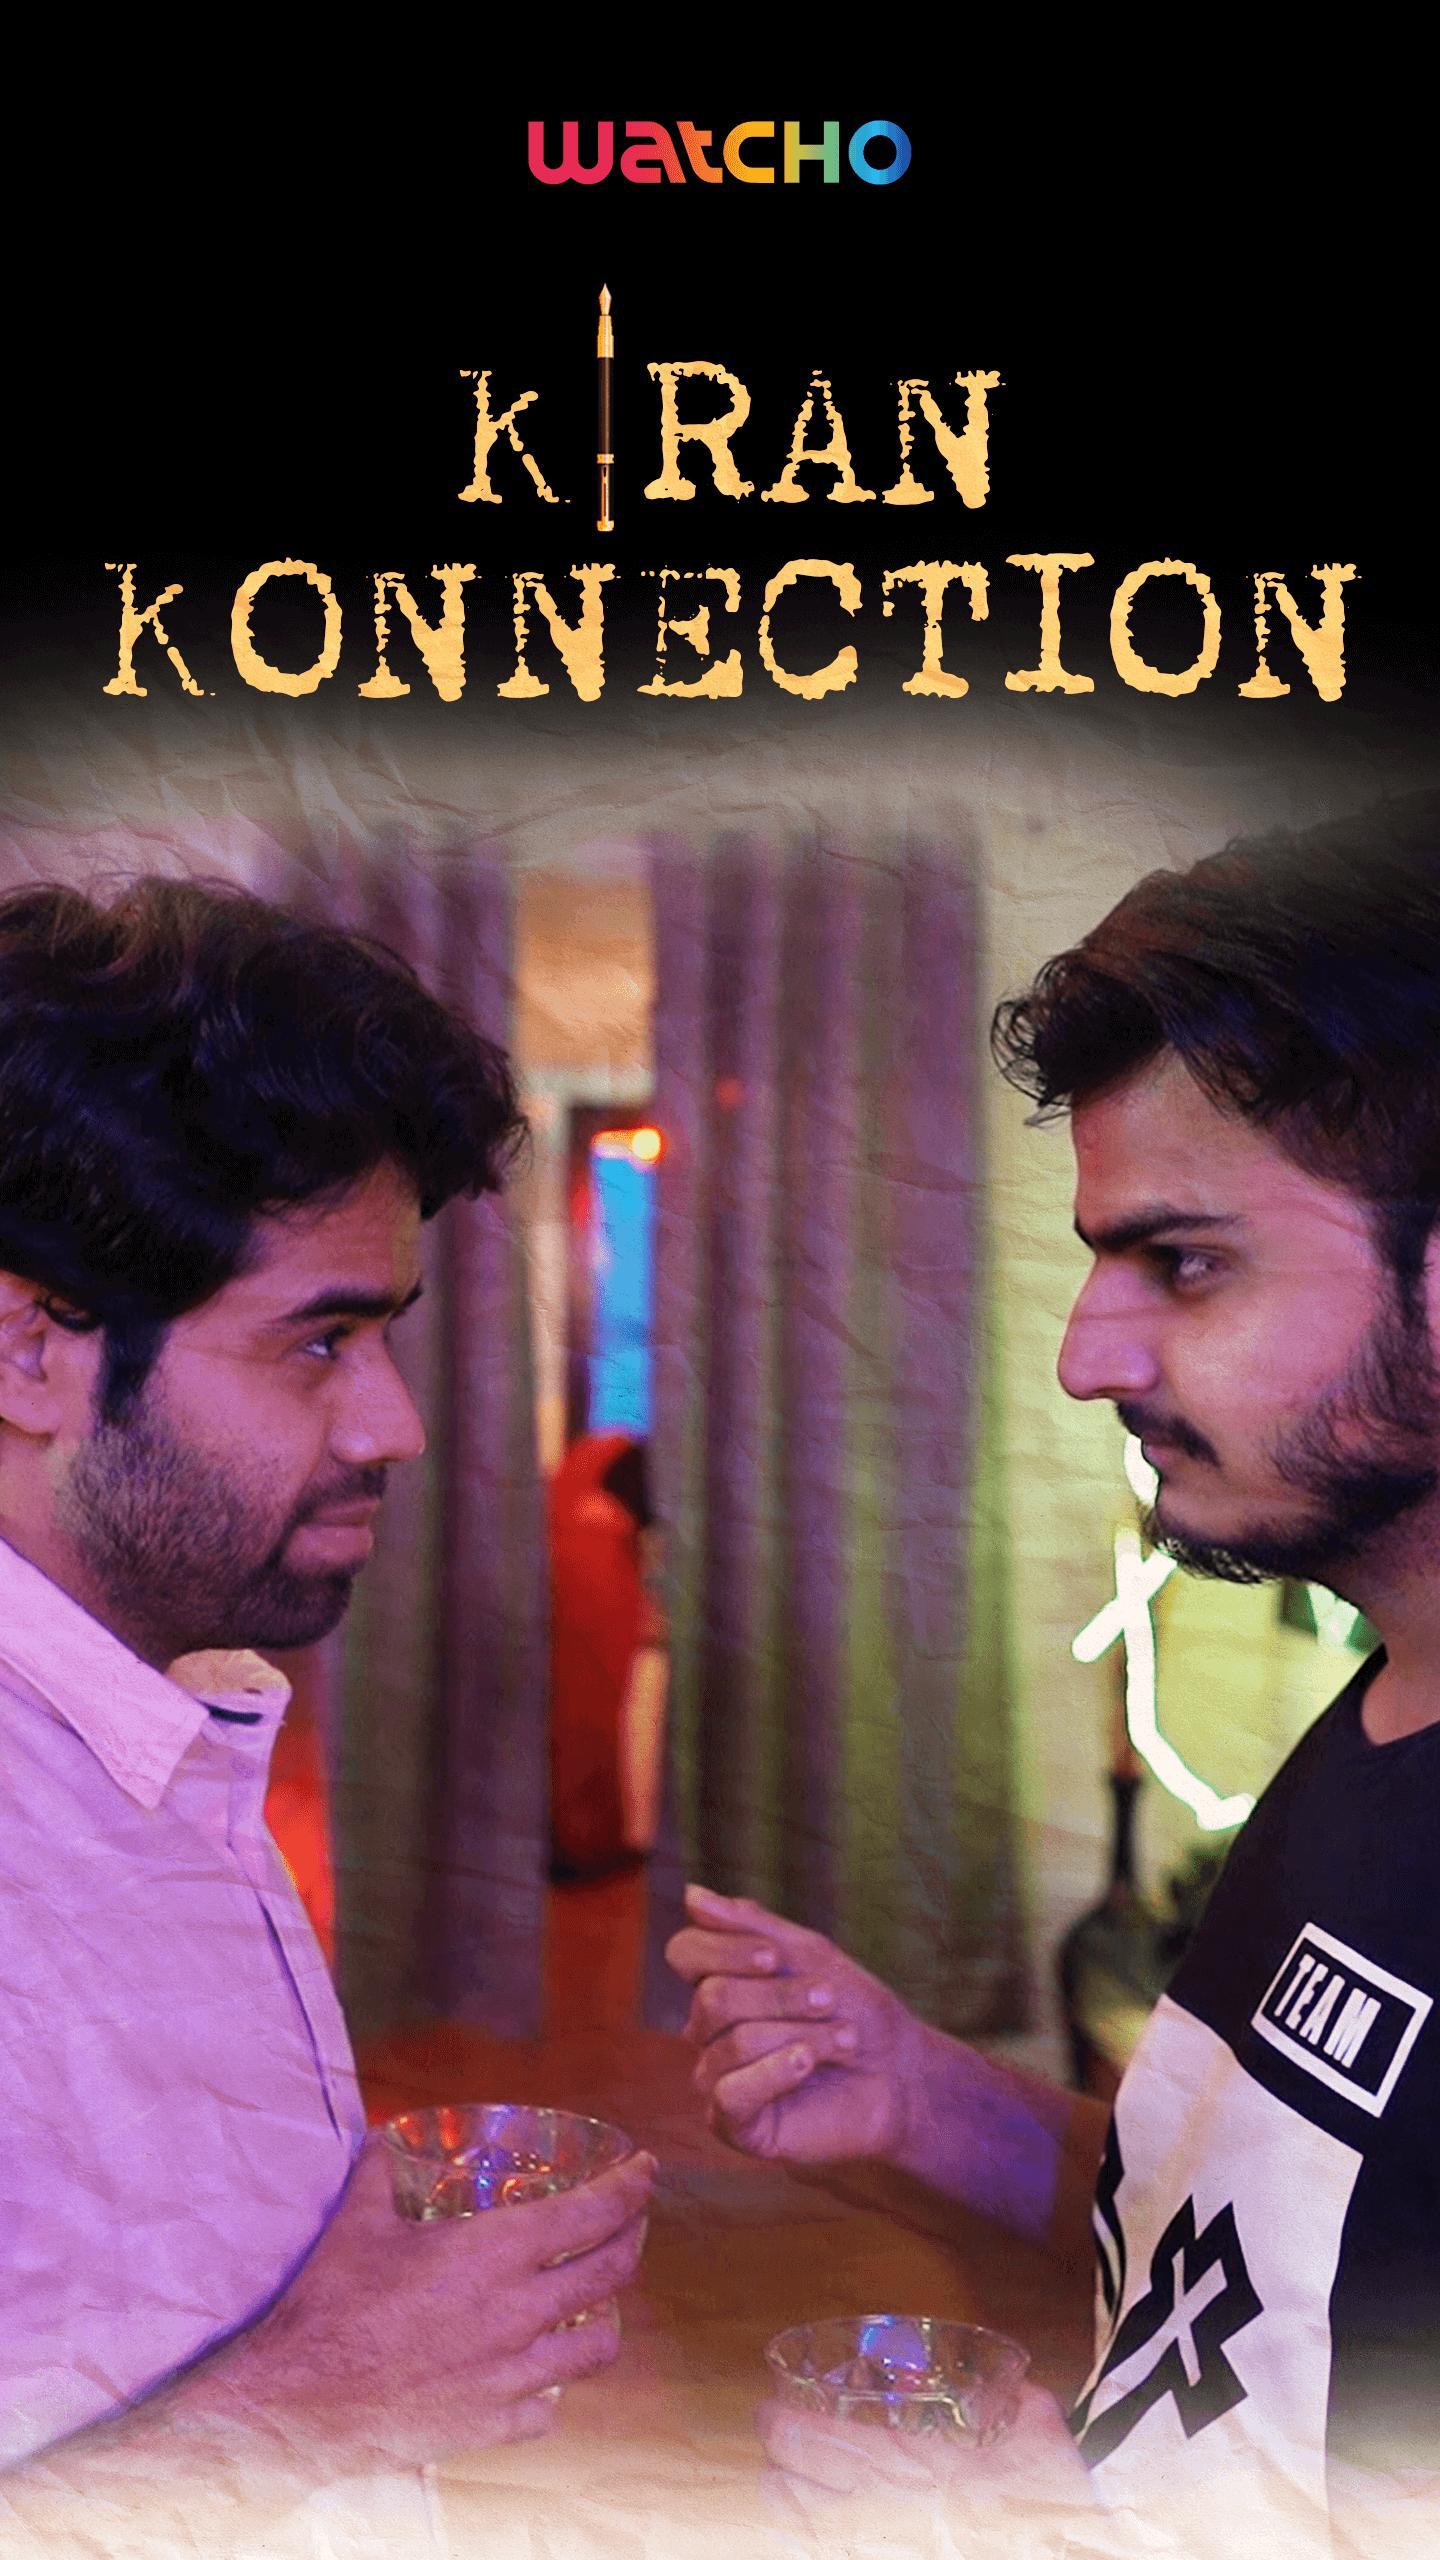 Kiran Konnection (TV Mini-Series 2019) - IMDb